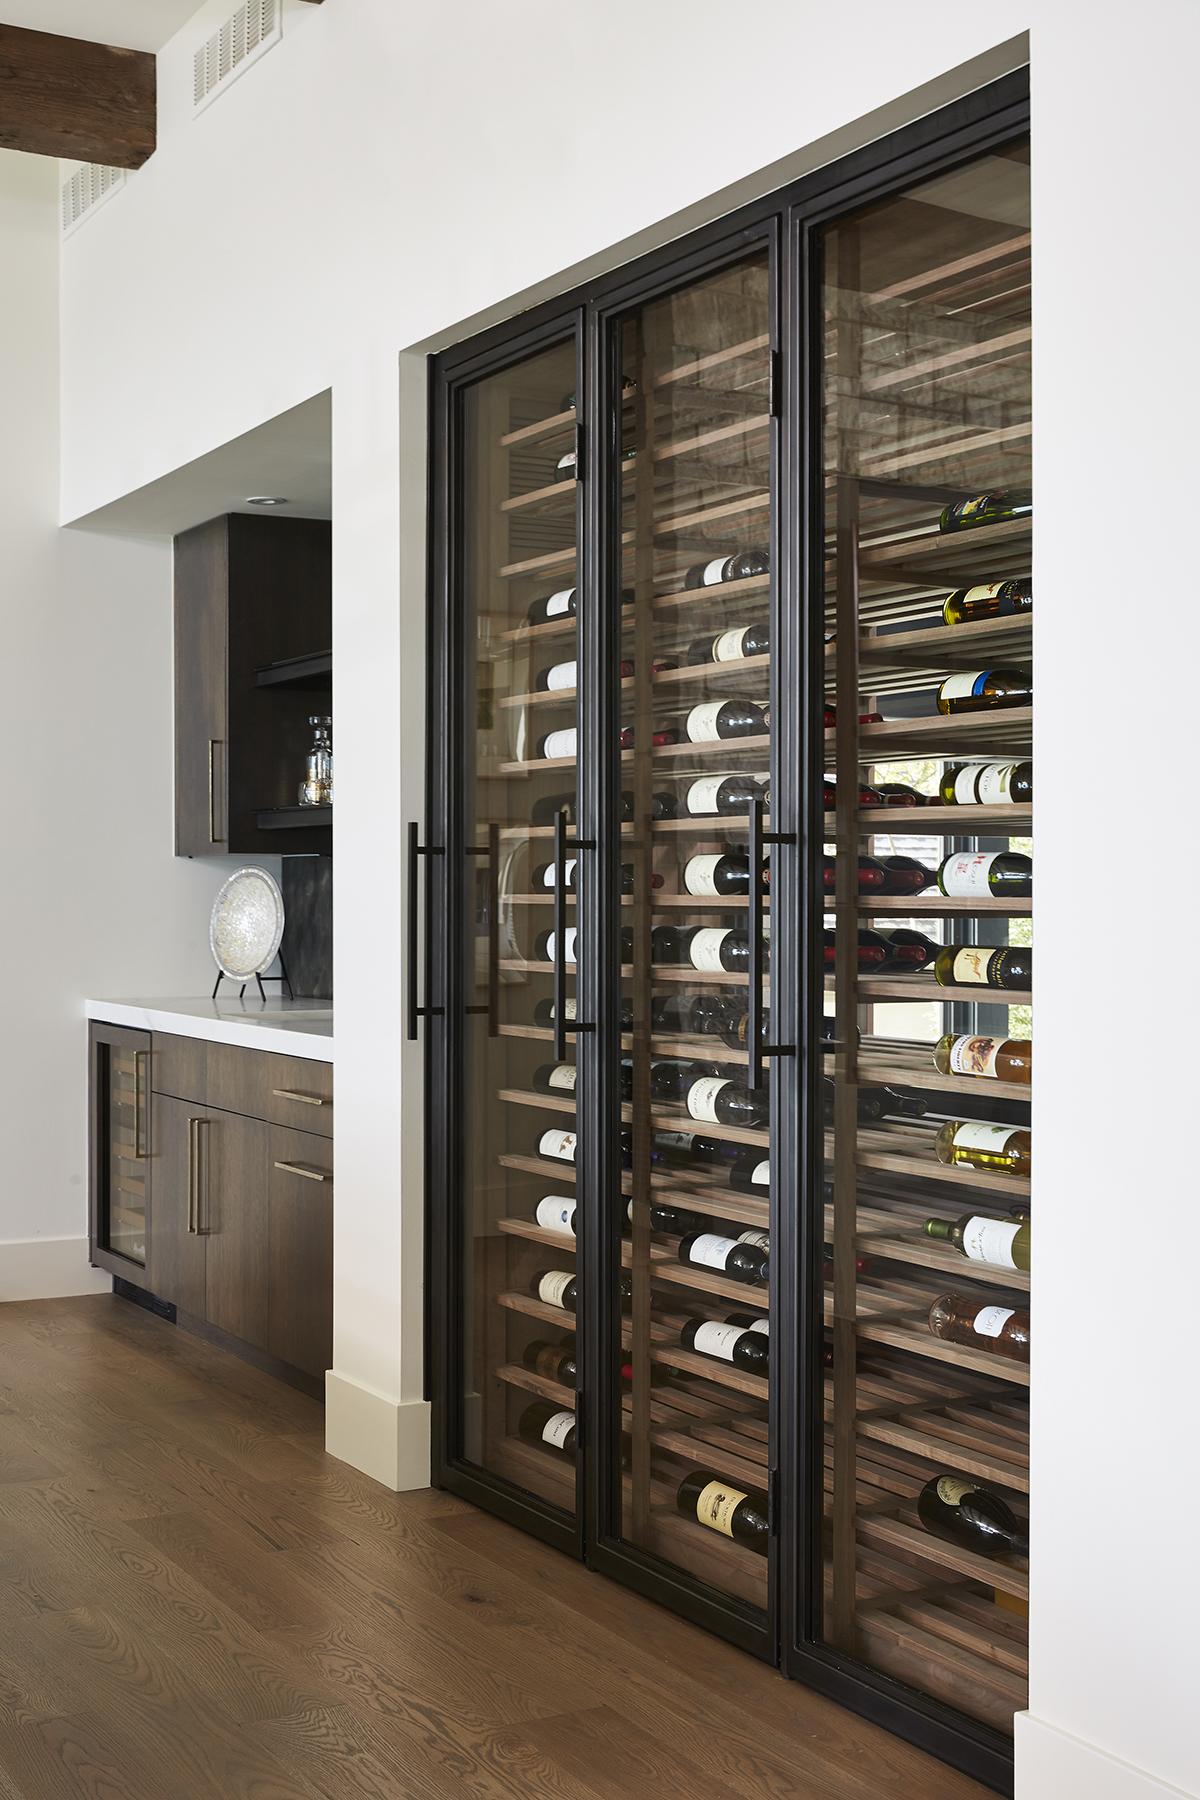 wine doors bauer metal fabrication fabricator custom blackened steel architectural metal interior design minnesota mn 3.jpg